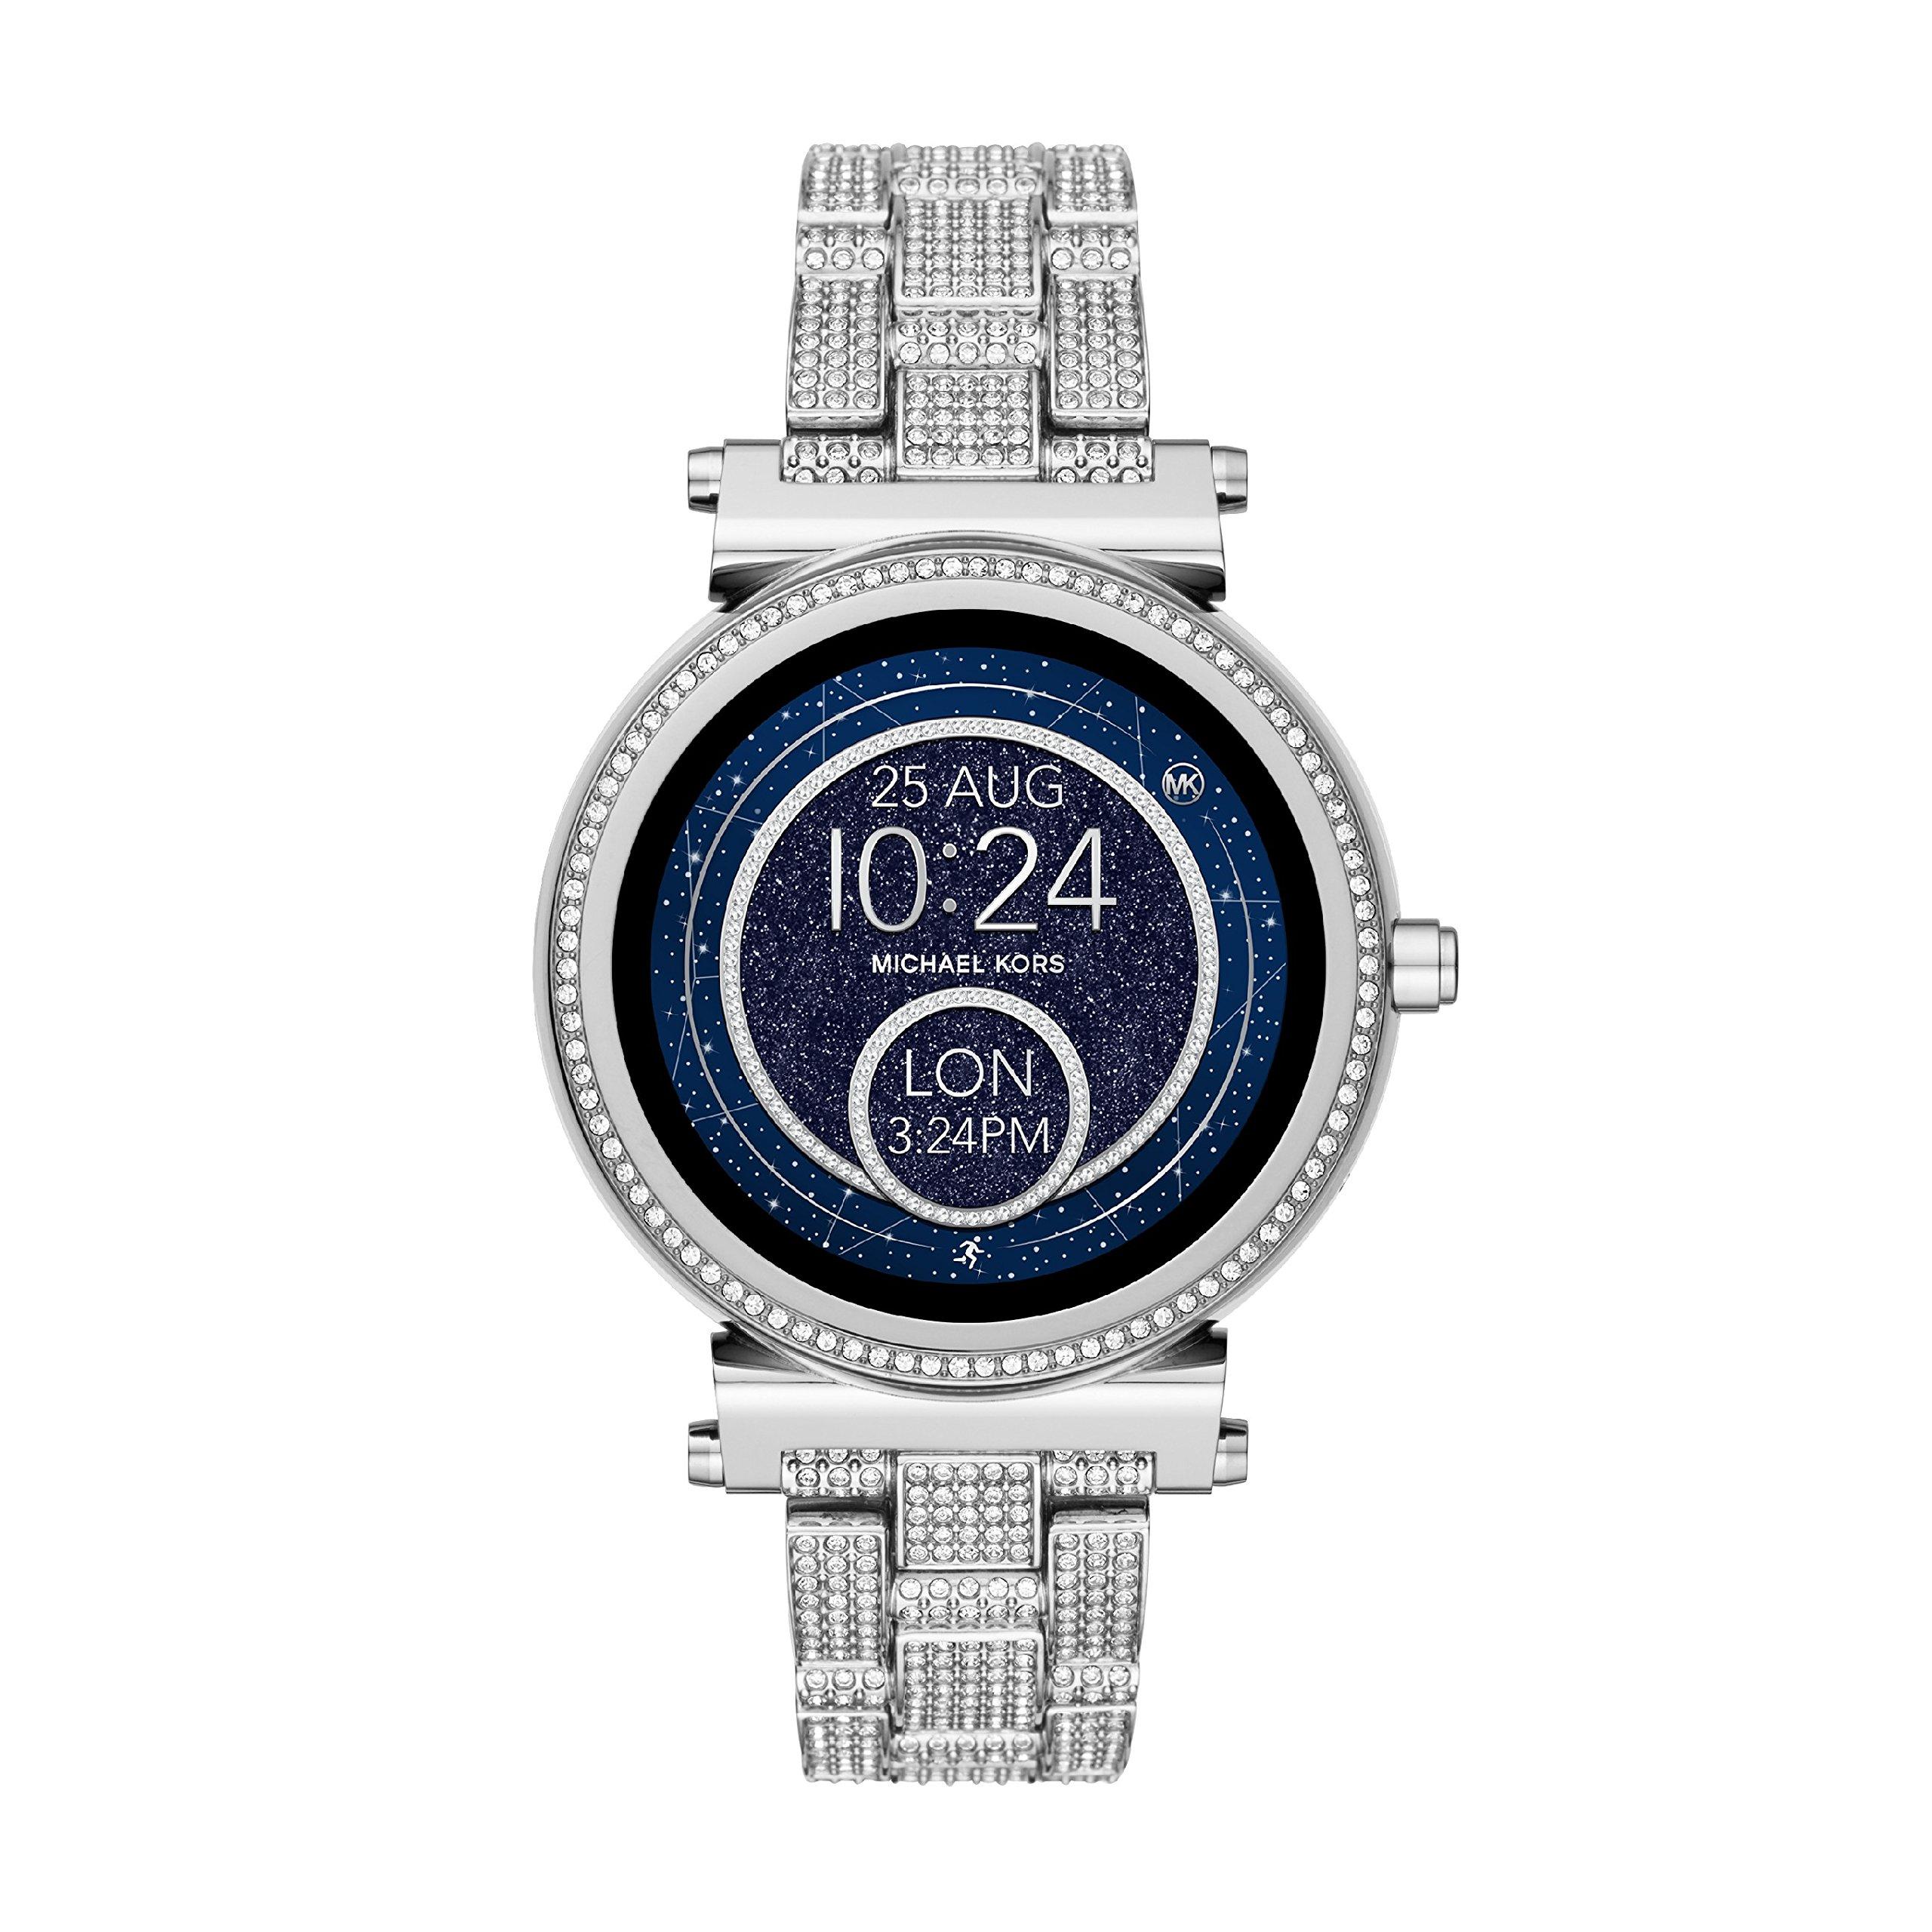 1d2187e1b7b1 Michael Kors Damen Digital Uhr mit Edelstahl Armband MKT5023 ...